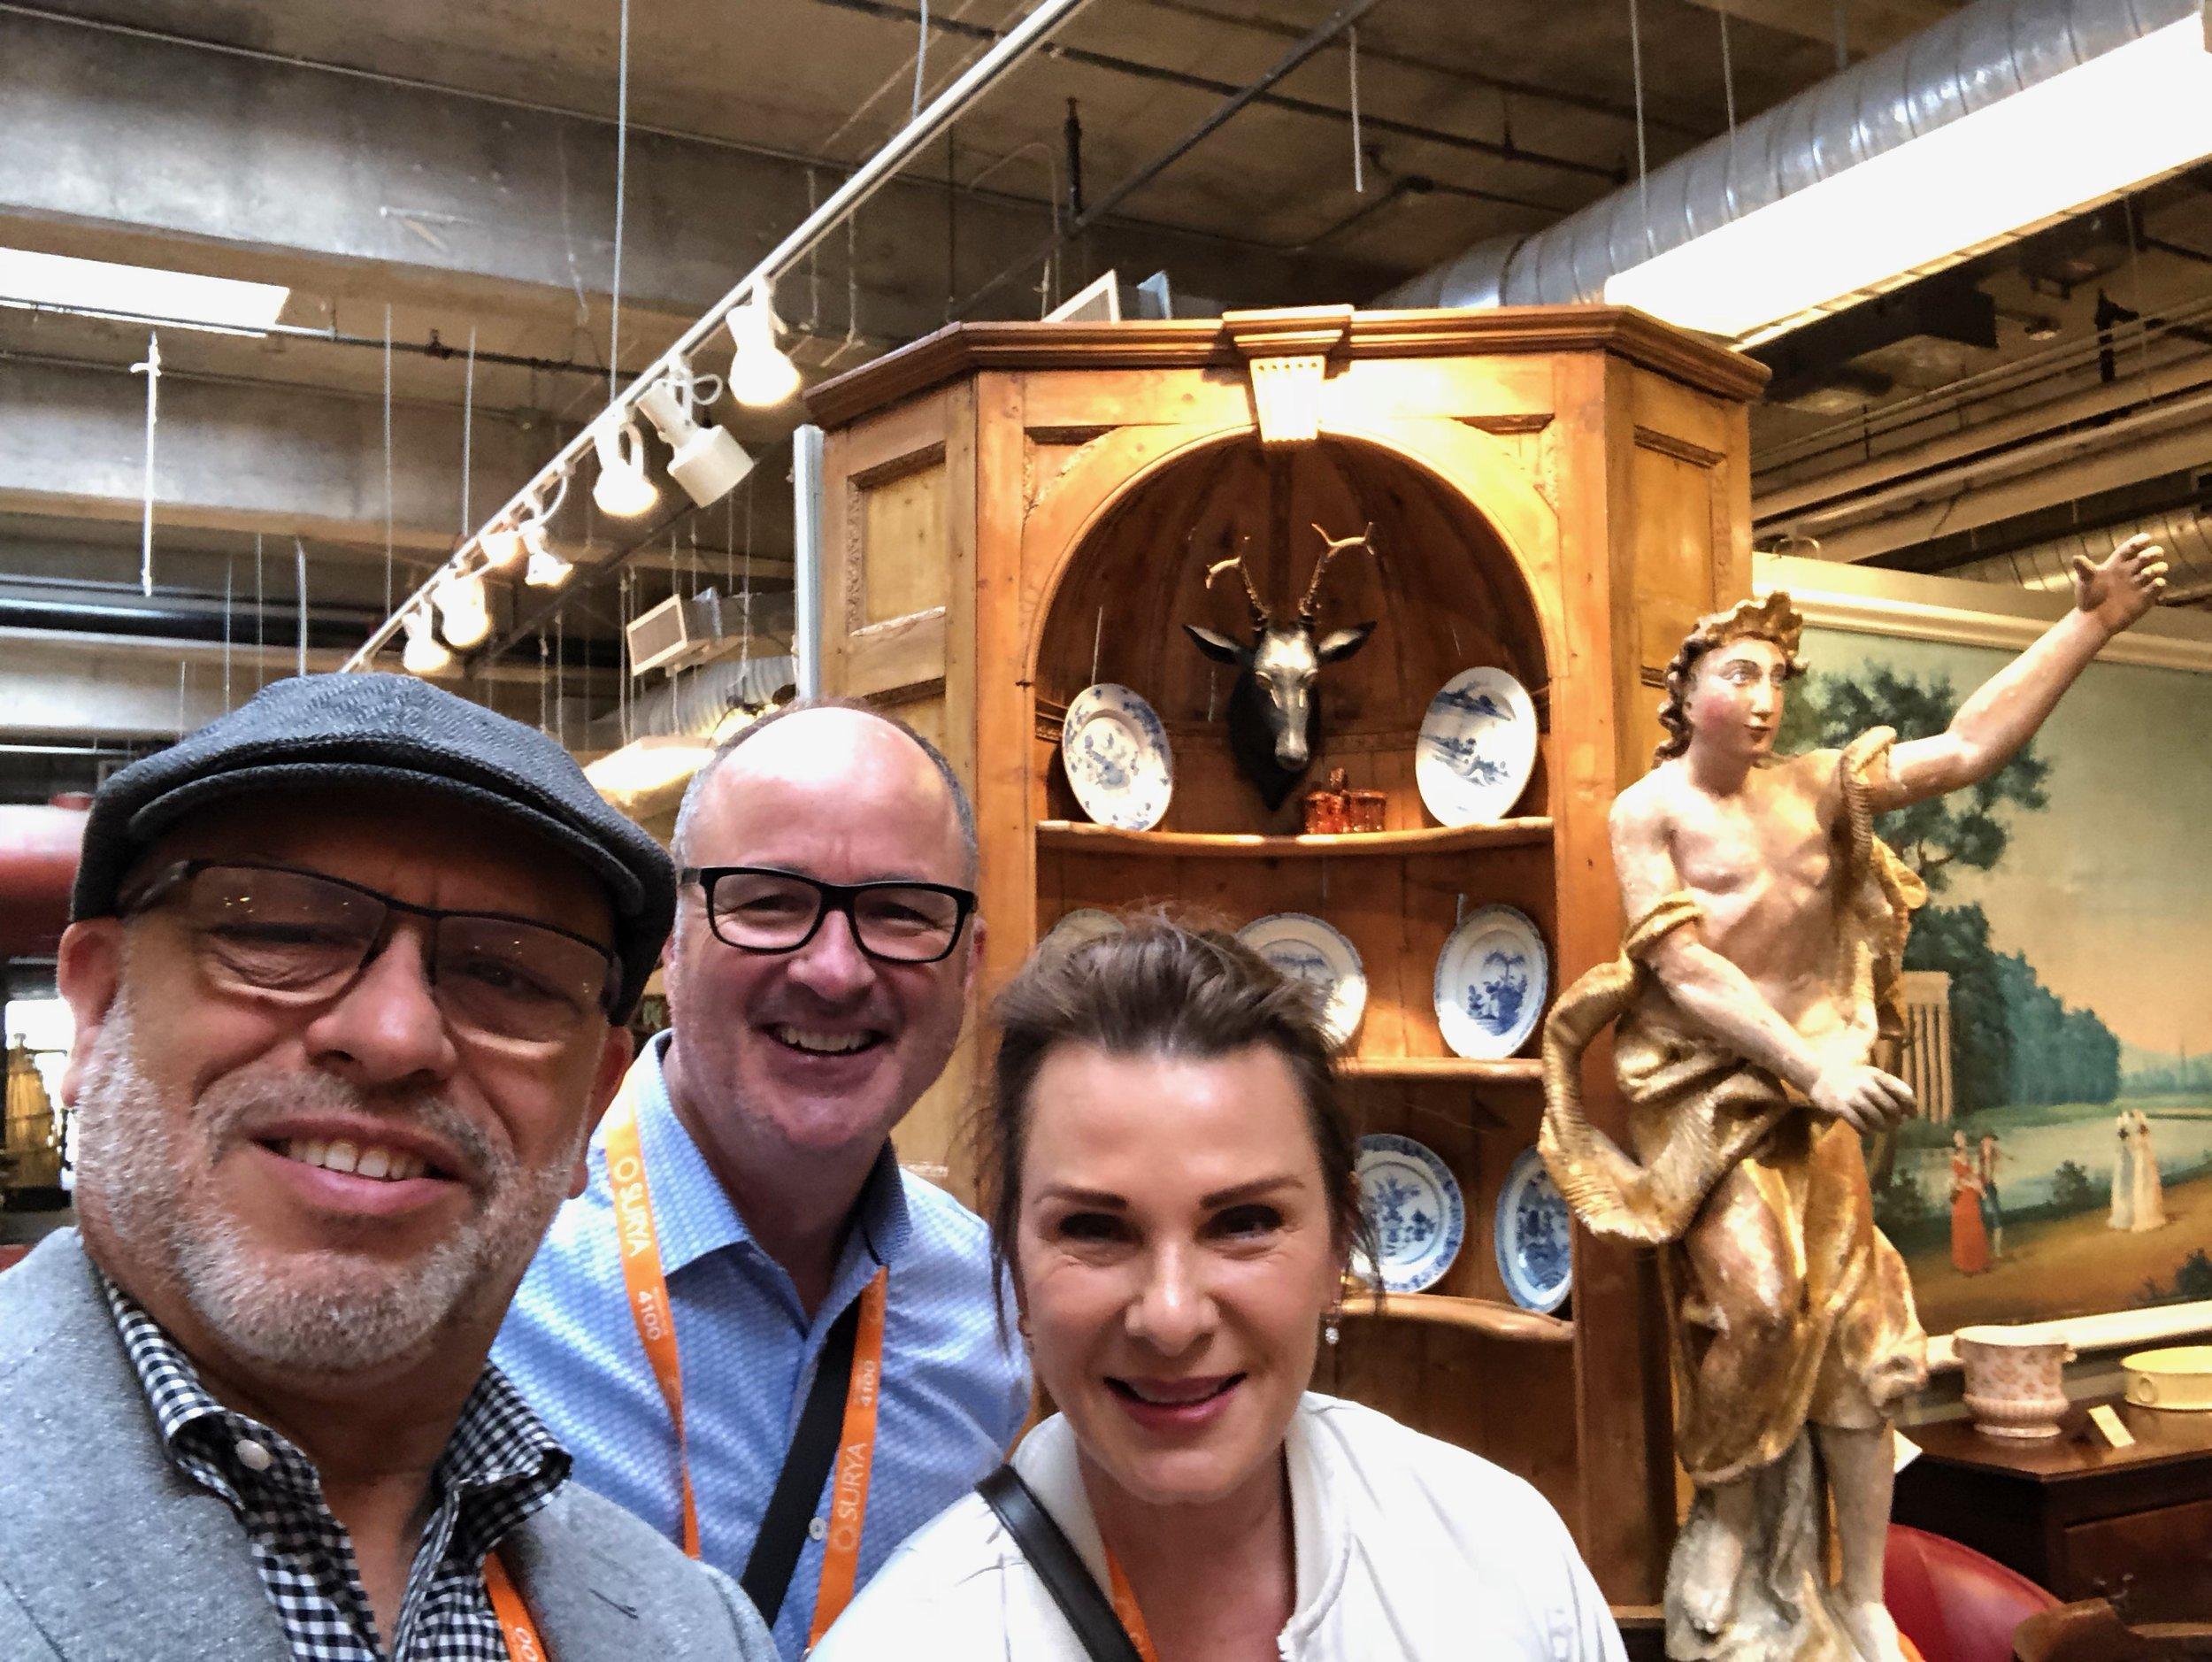 Always fun to run into Rodger and Jamilynn Fournier at Market